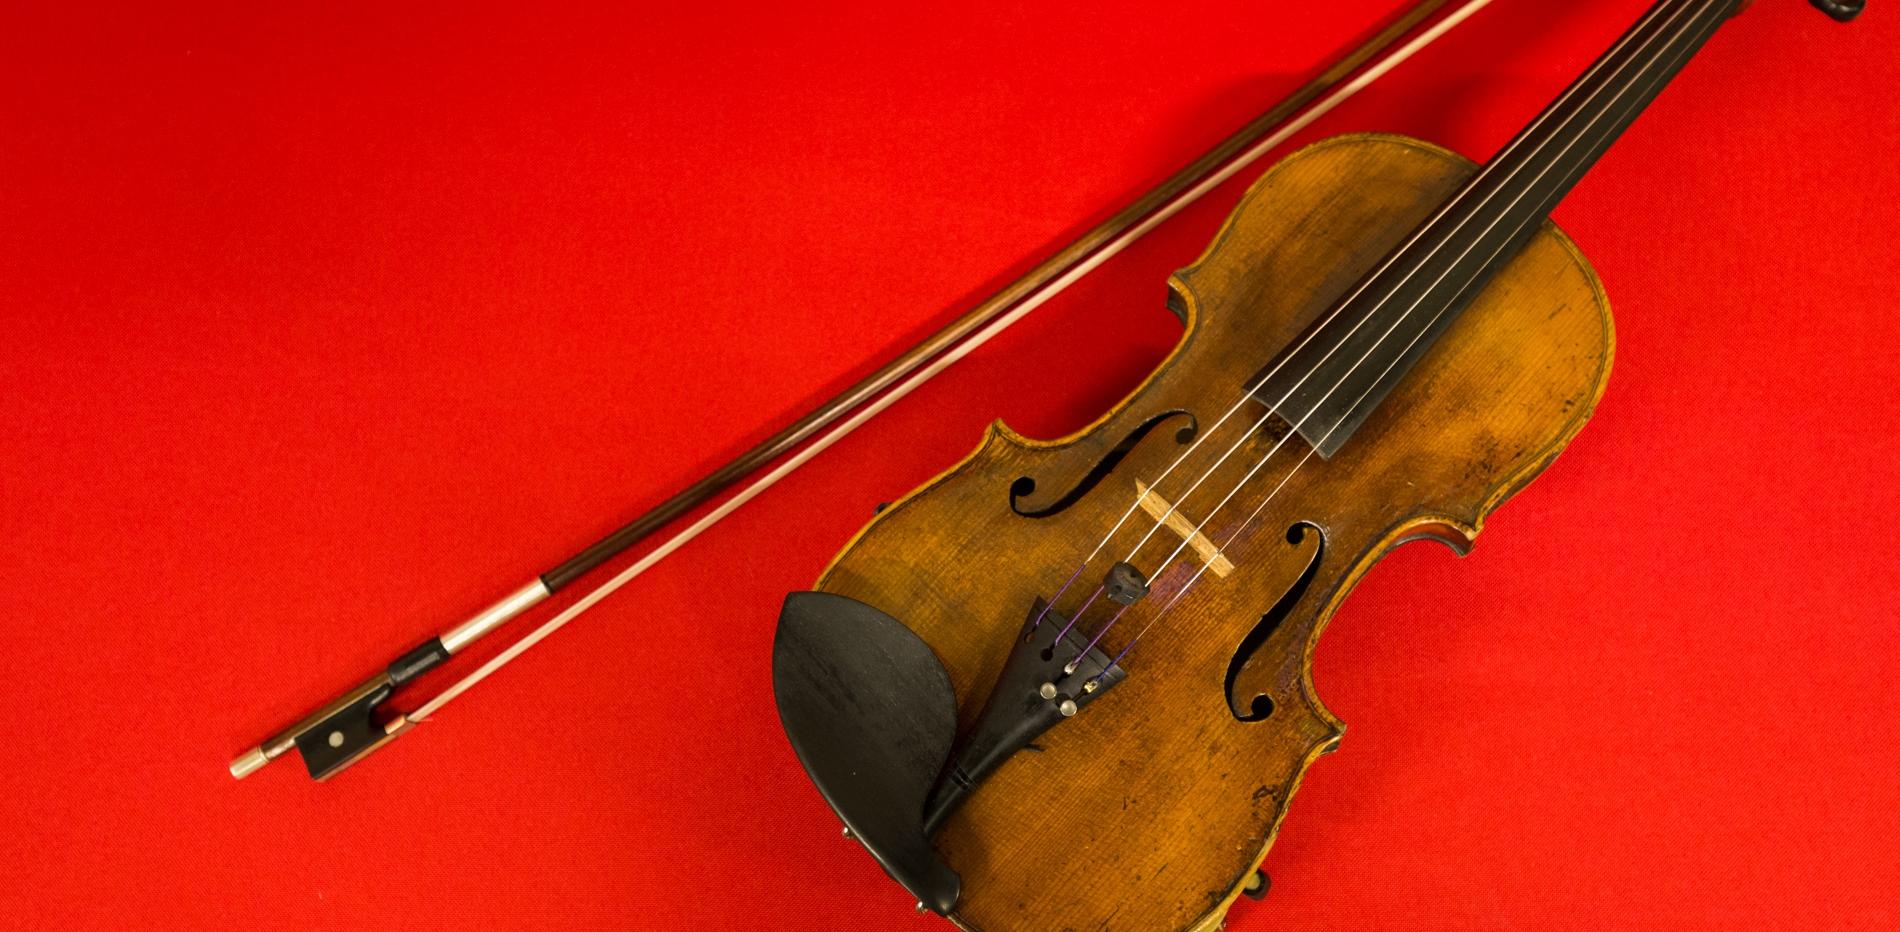 5th International Karol Lipiński Violin Competition 2019